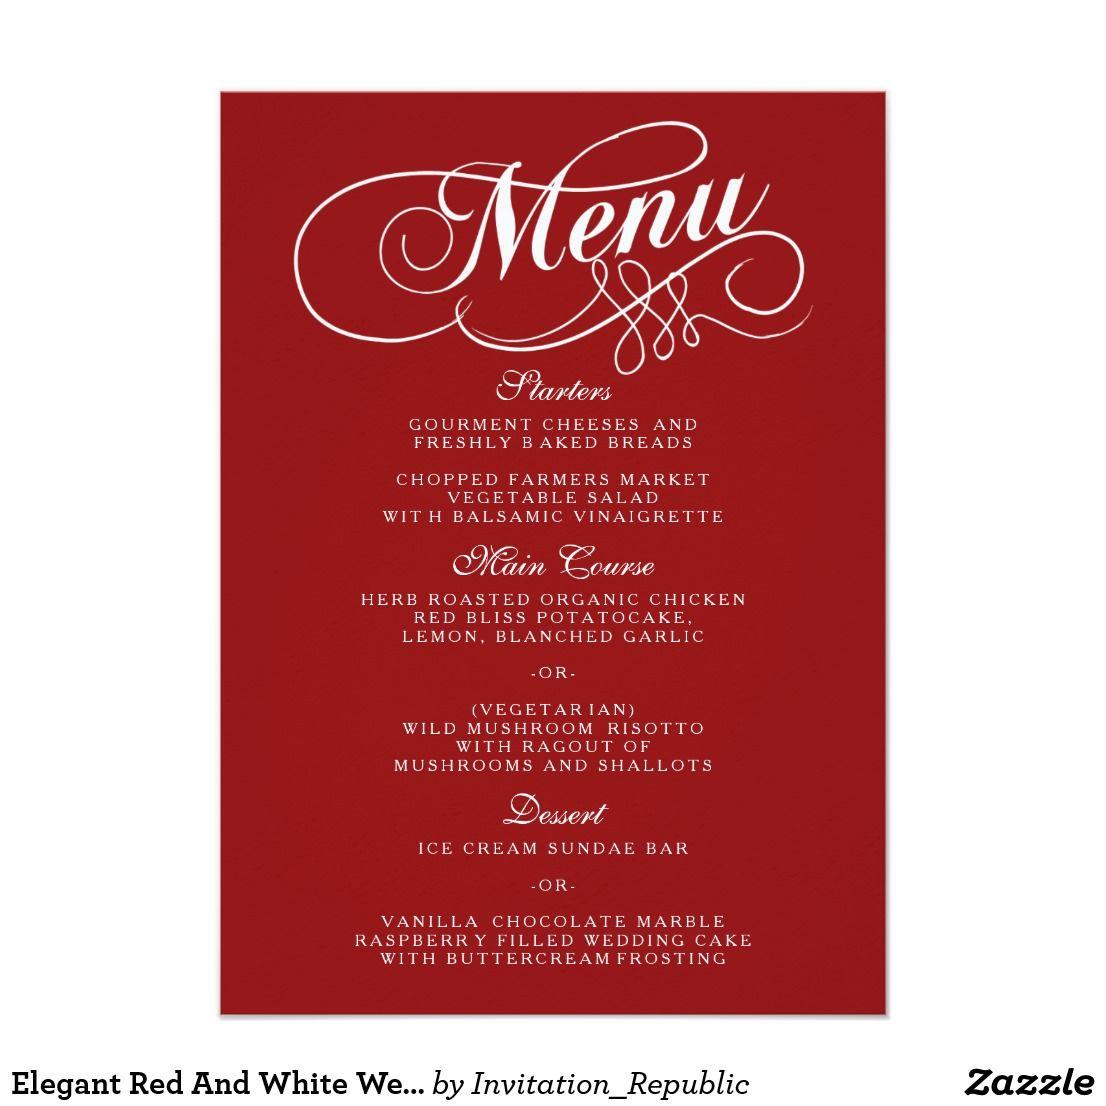 Elegant Red And White Wedding Menu Templates   Wedding menu template ...